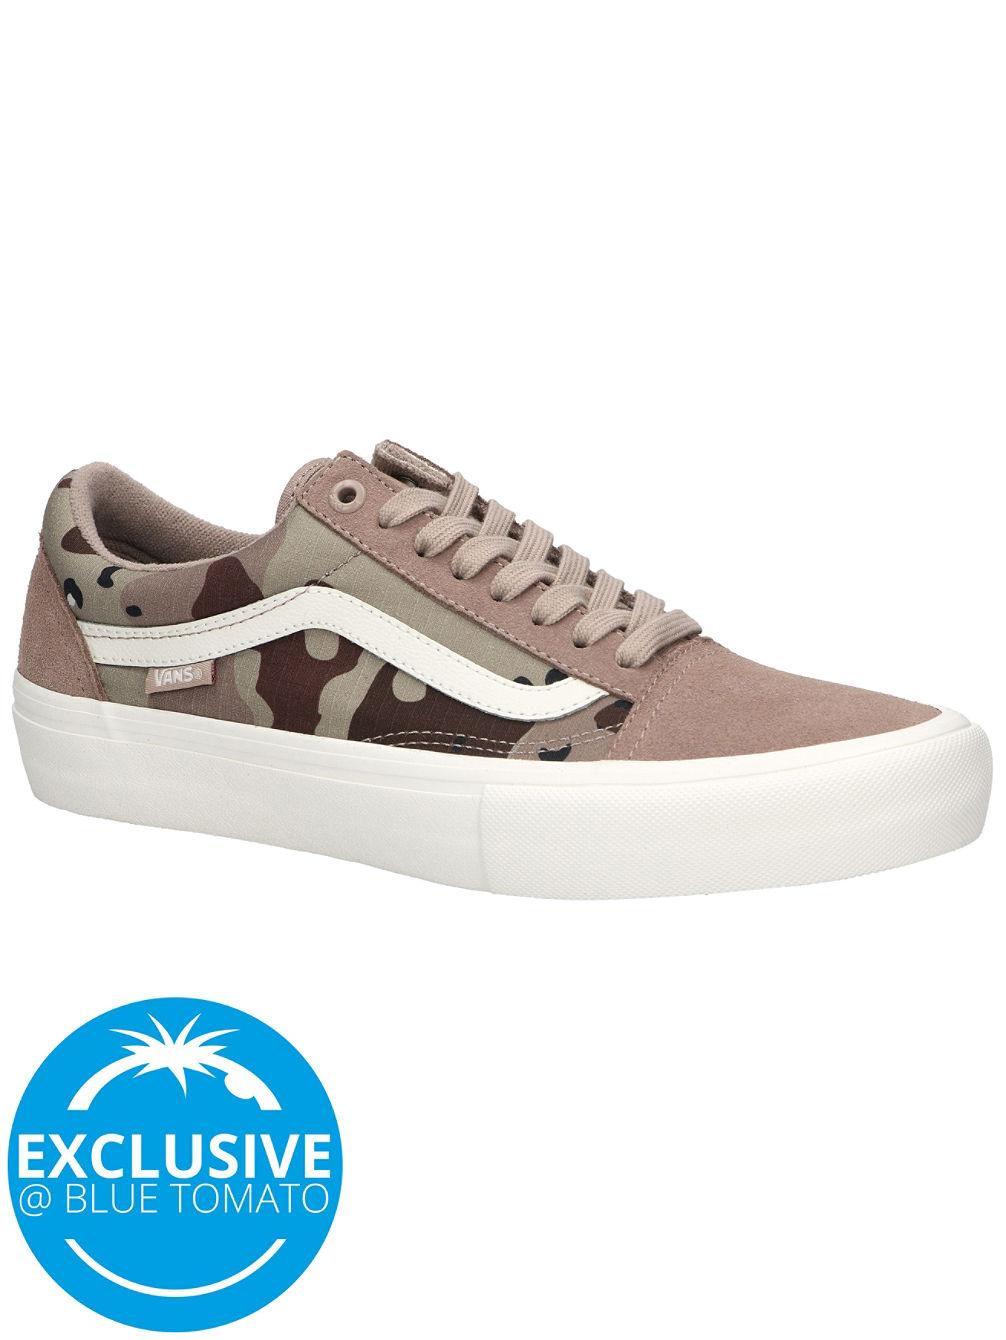 6d13dafe2641ac Compra Vans Desert Camo Old Skool Pro Zapatillas de Skate en línea en Blue  Tomato